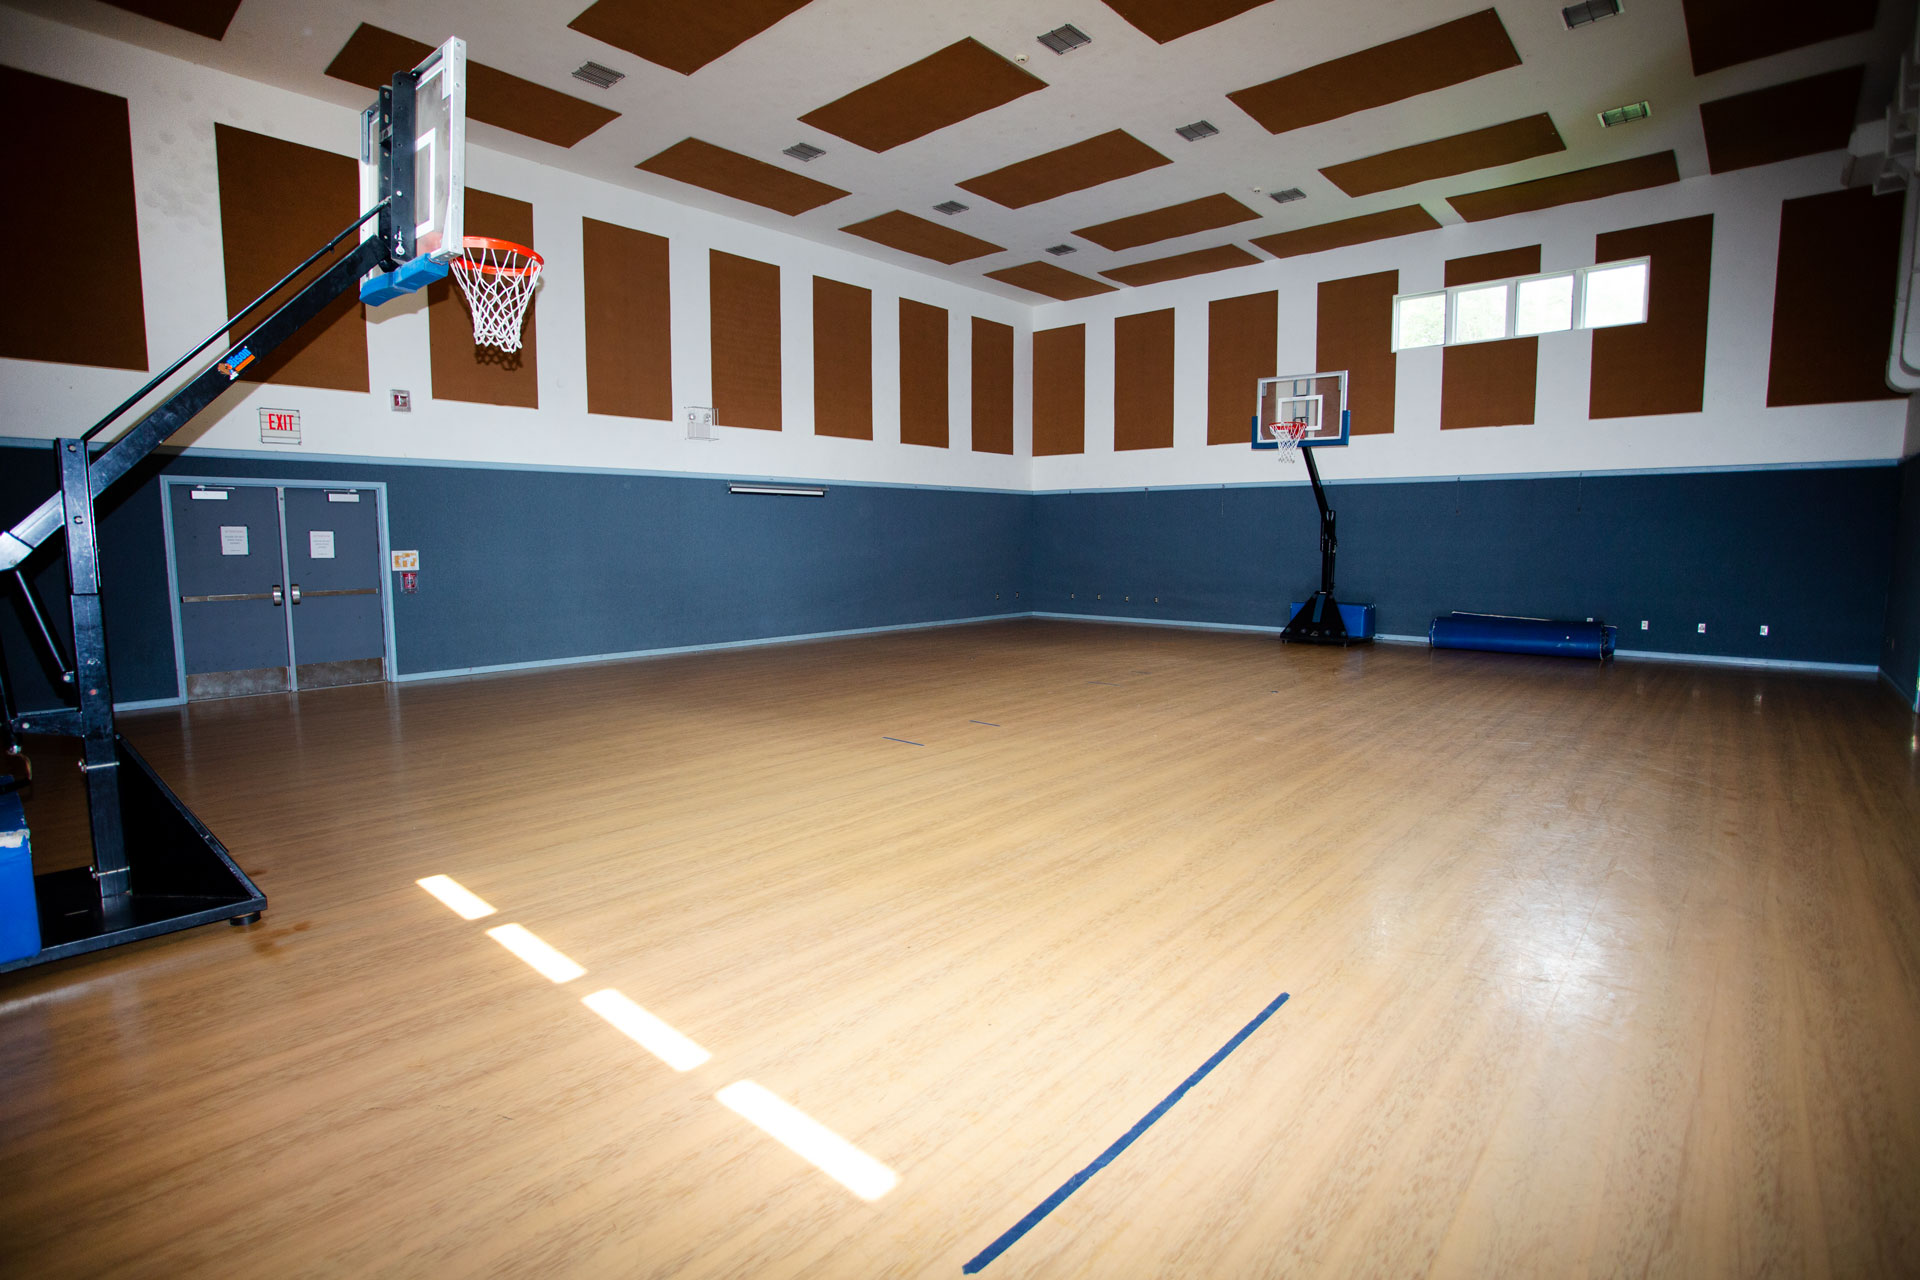 YWCA Westfield fitness center court gym after school programs